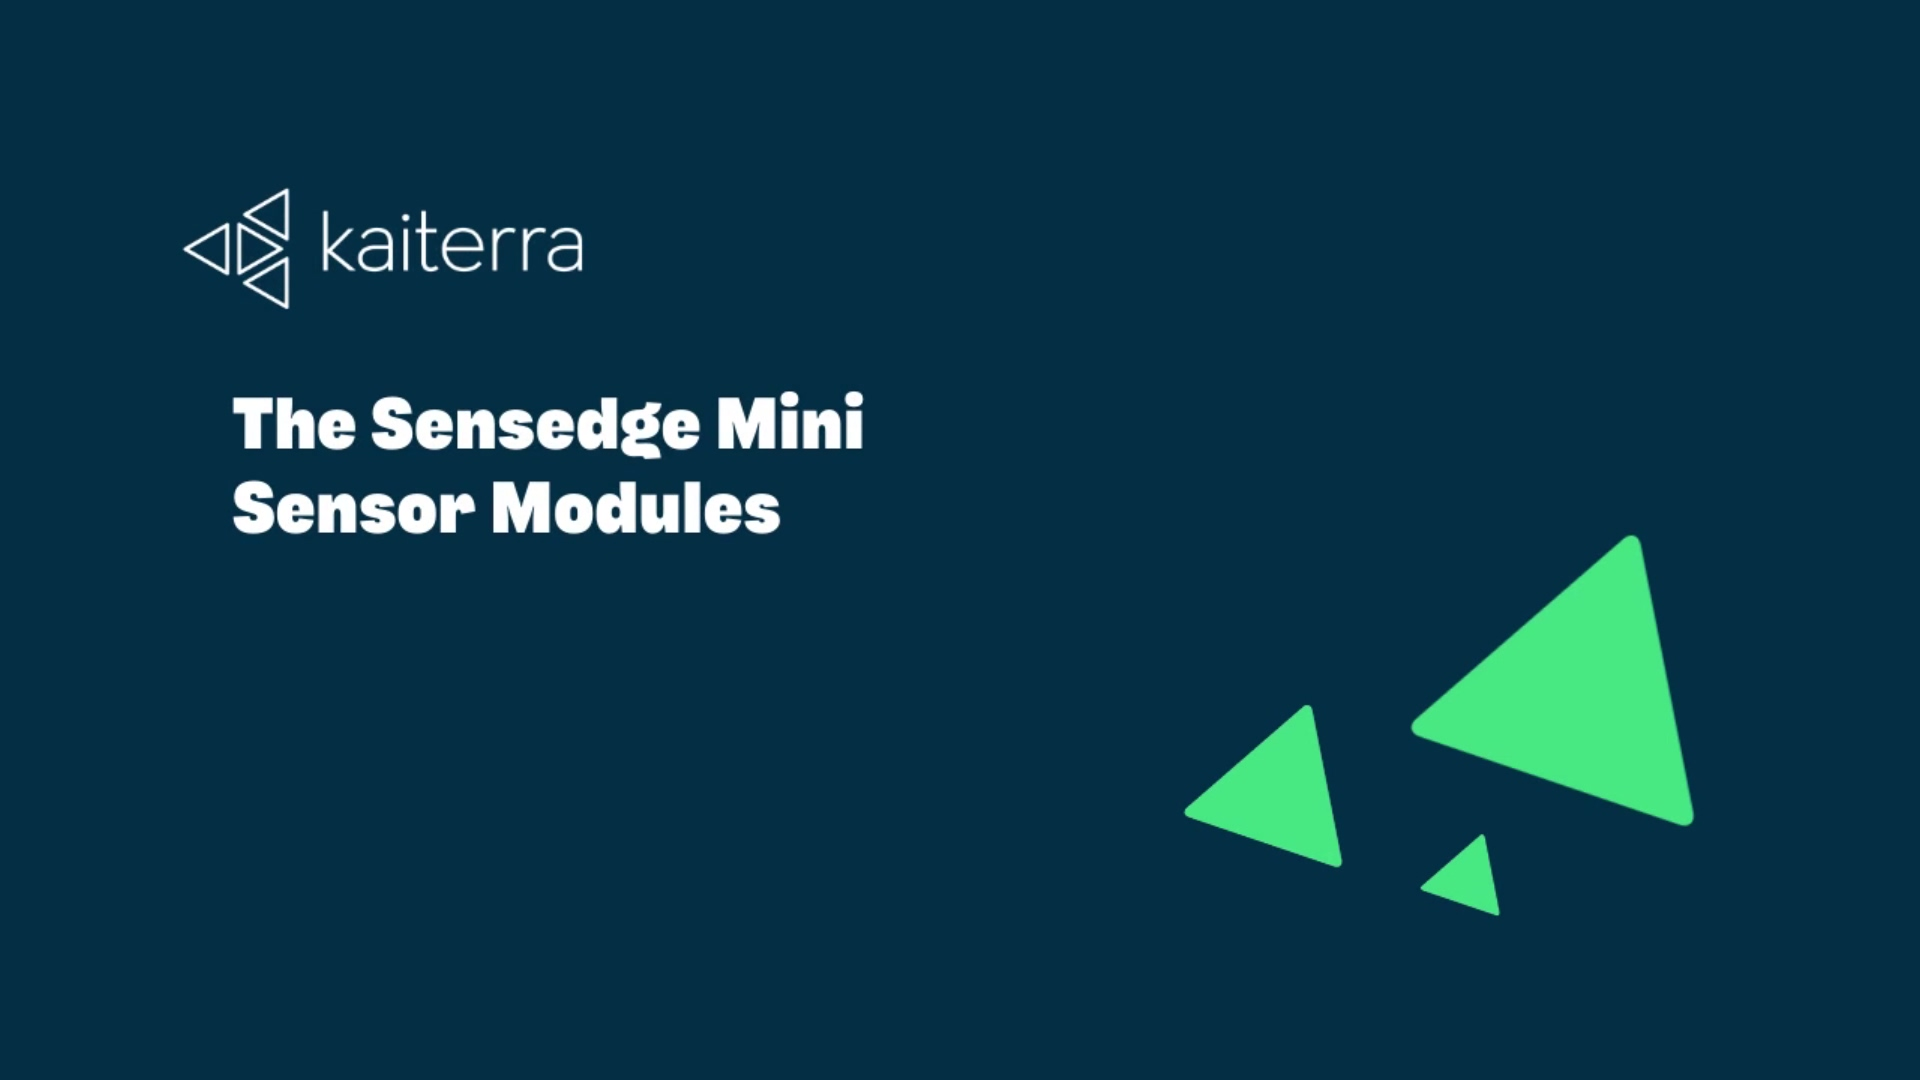 The Sensedge Mini Sensor Modules